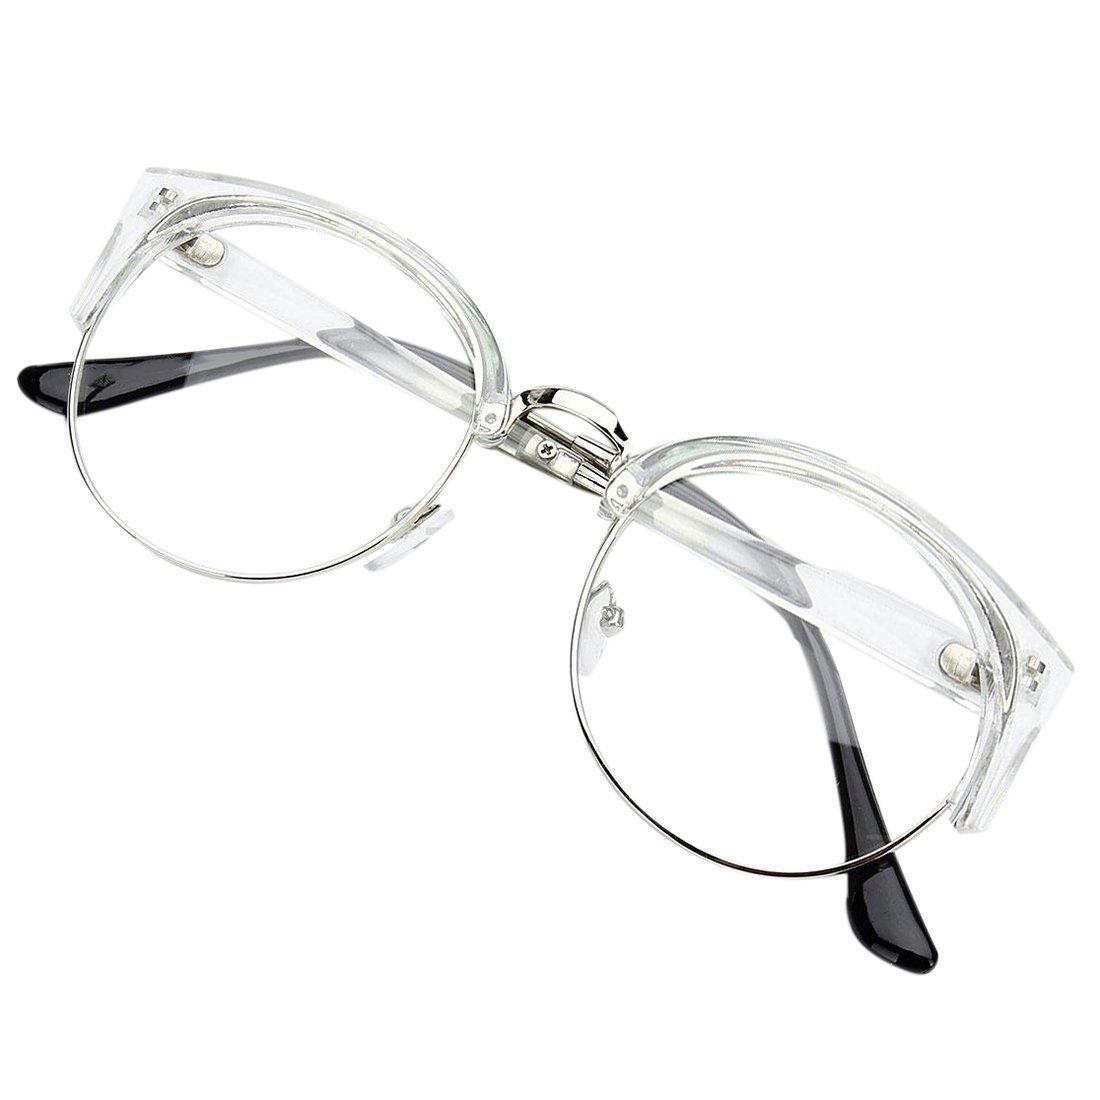 00eedb43fe27 TOOGOO(R) Retro Style Women Men Round Nerd Glasses Clear Lens Eyewear Metal  Frame Glasses Colors:Transparent White+Silver Frame: Amazon.co.uk: Sports &  ...